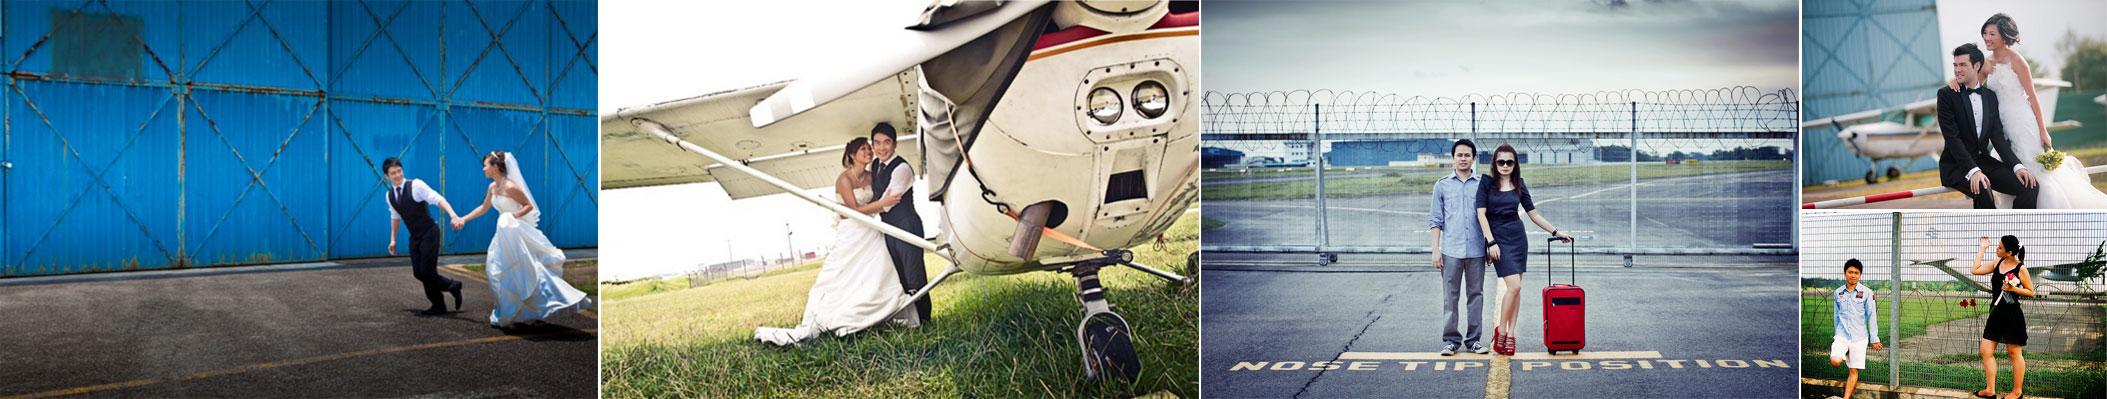 Seletar-Airbase-wedding